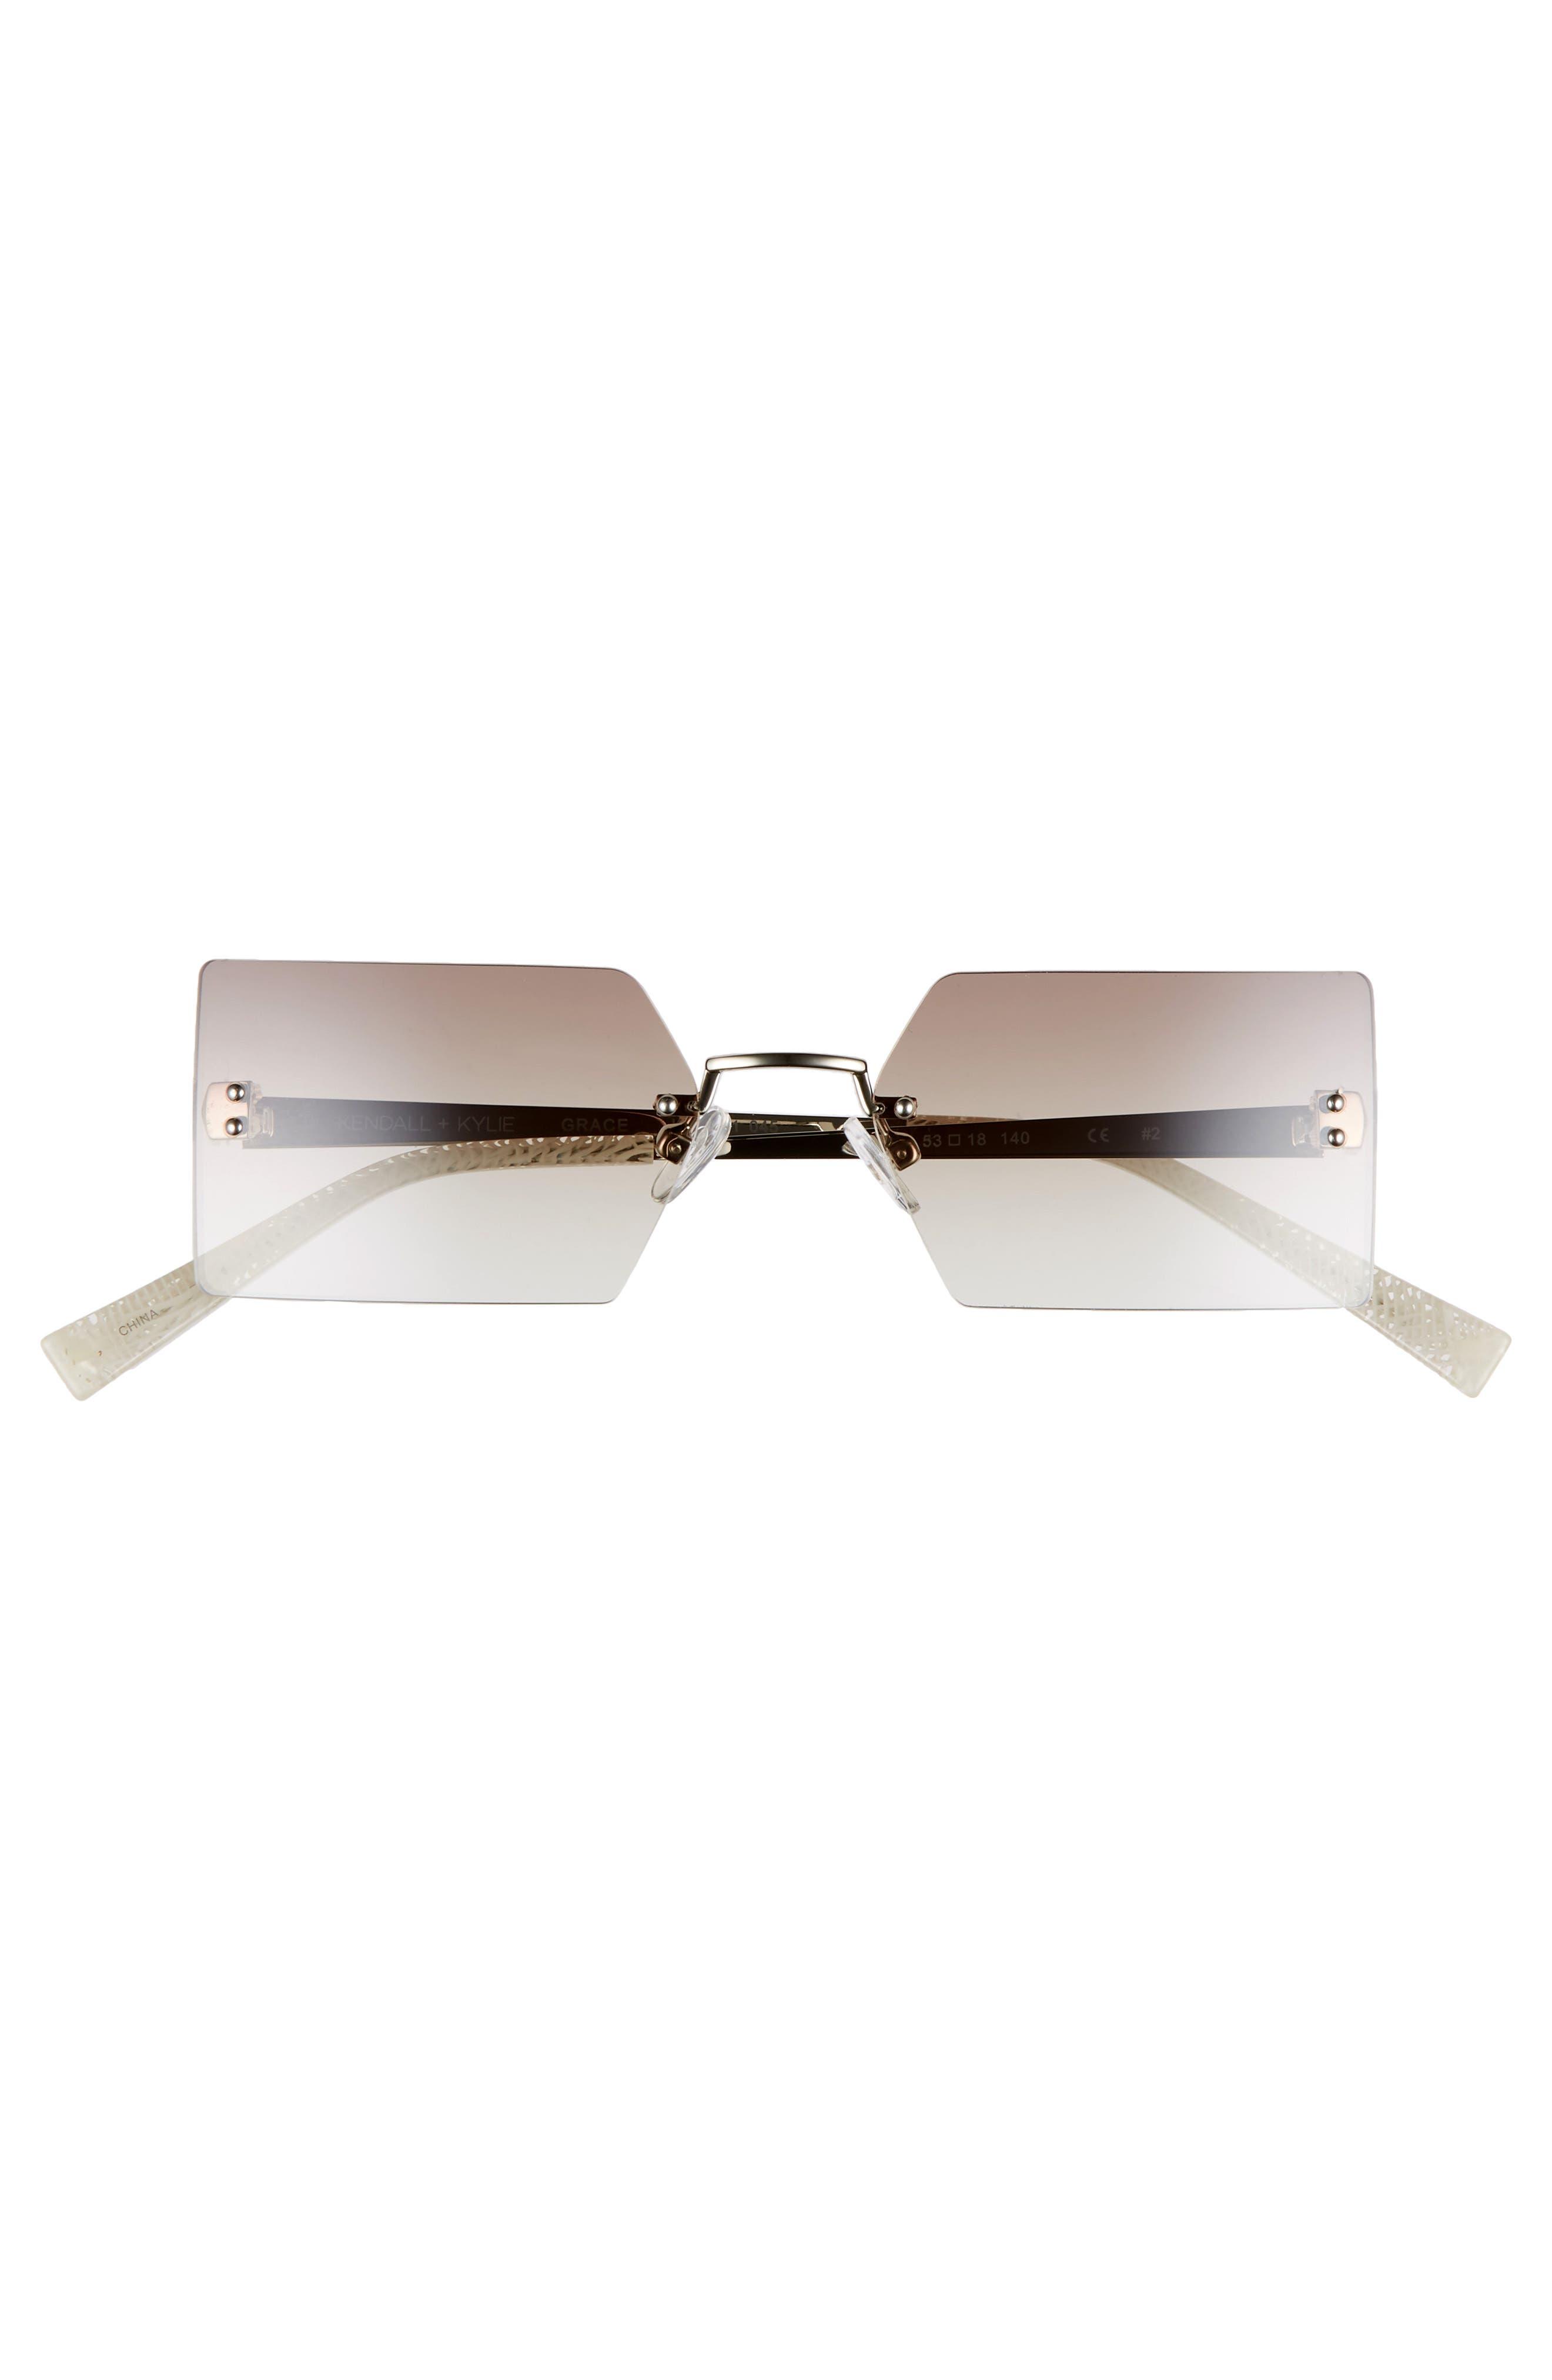 Grace 53mm Rimless Rectangular Sunglasses,                             Alternate thumbnail 3, color,                             SILVER/ BROWN/ CLEAR GRADIENT